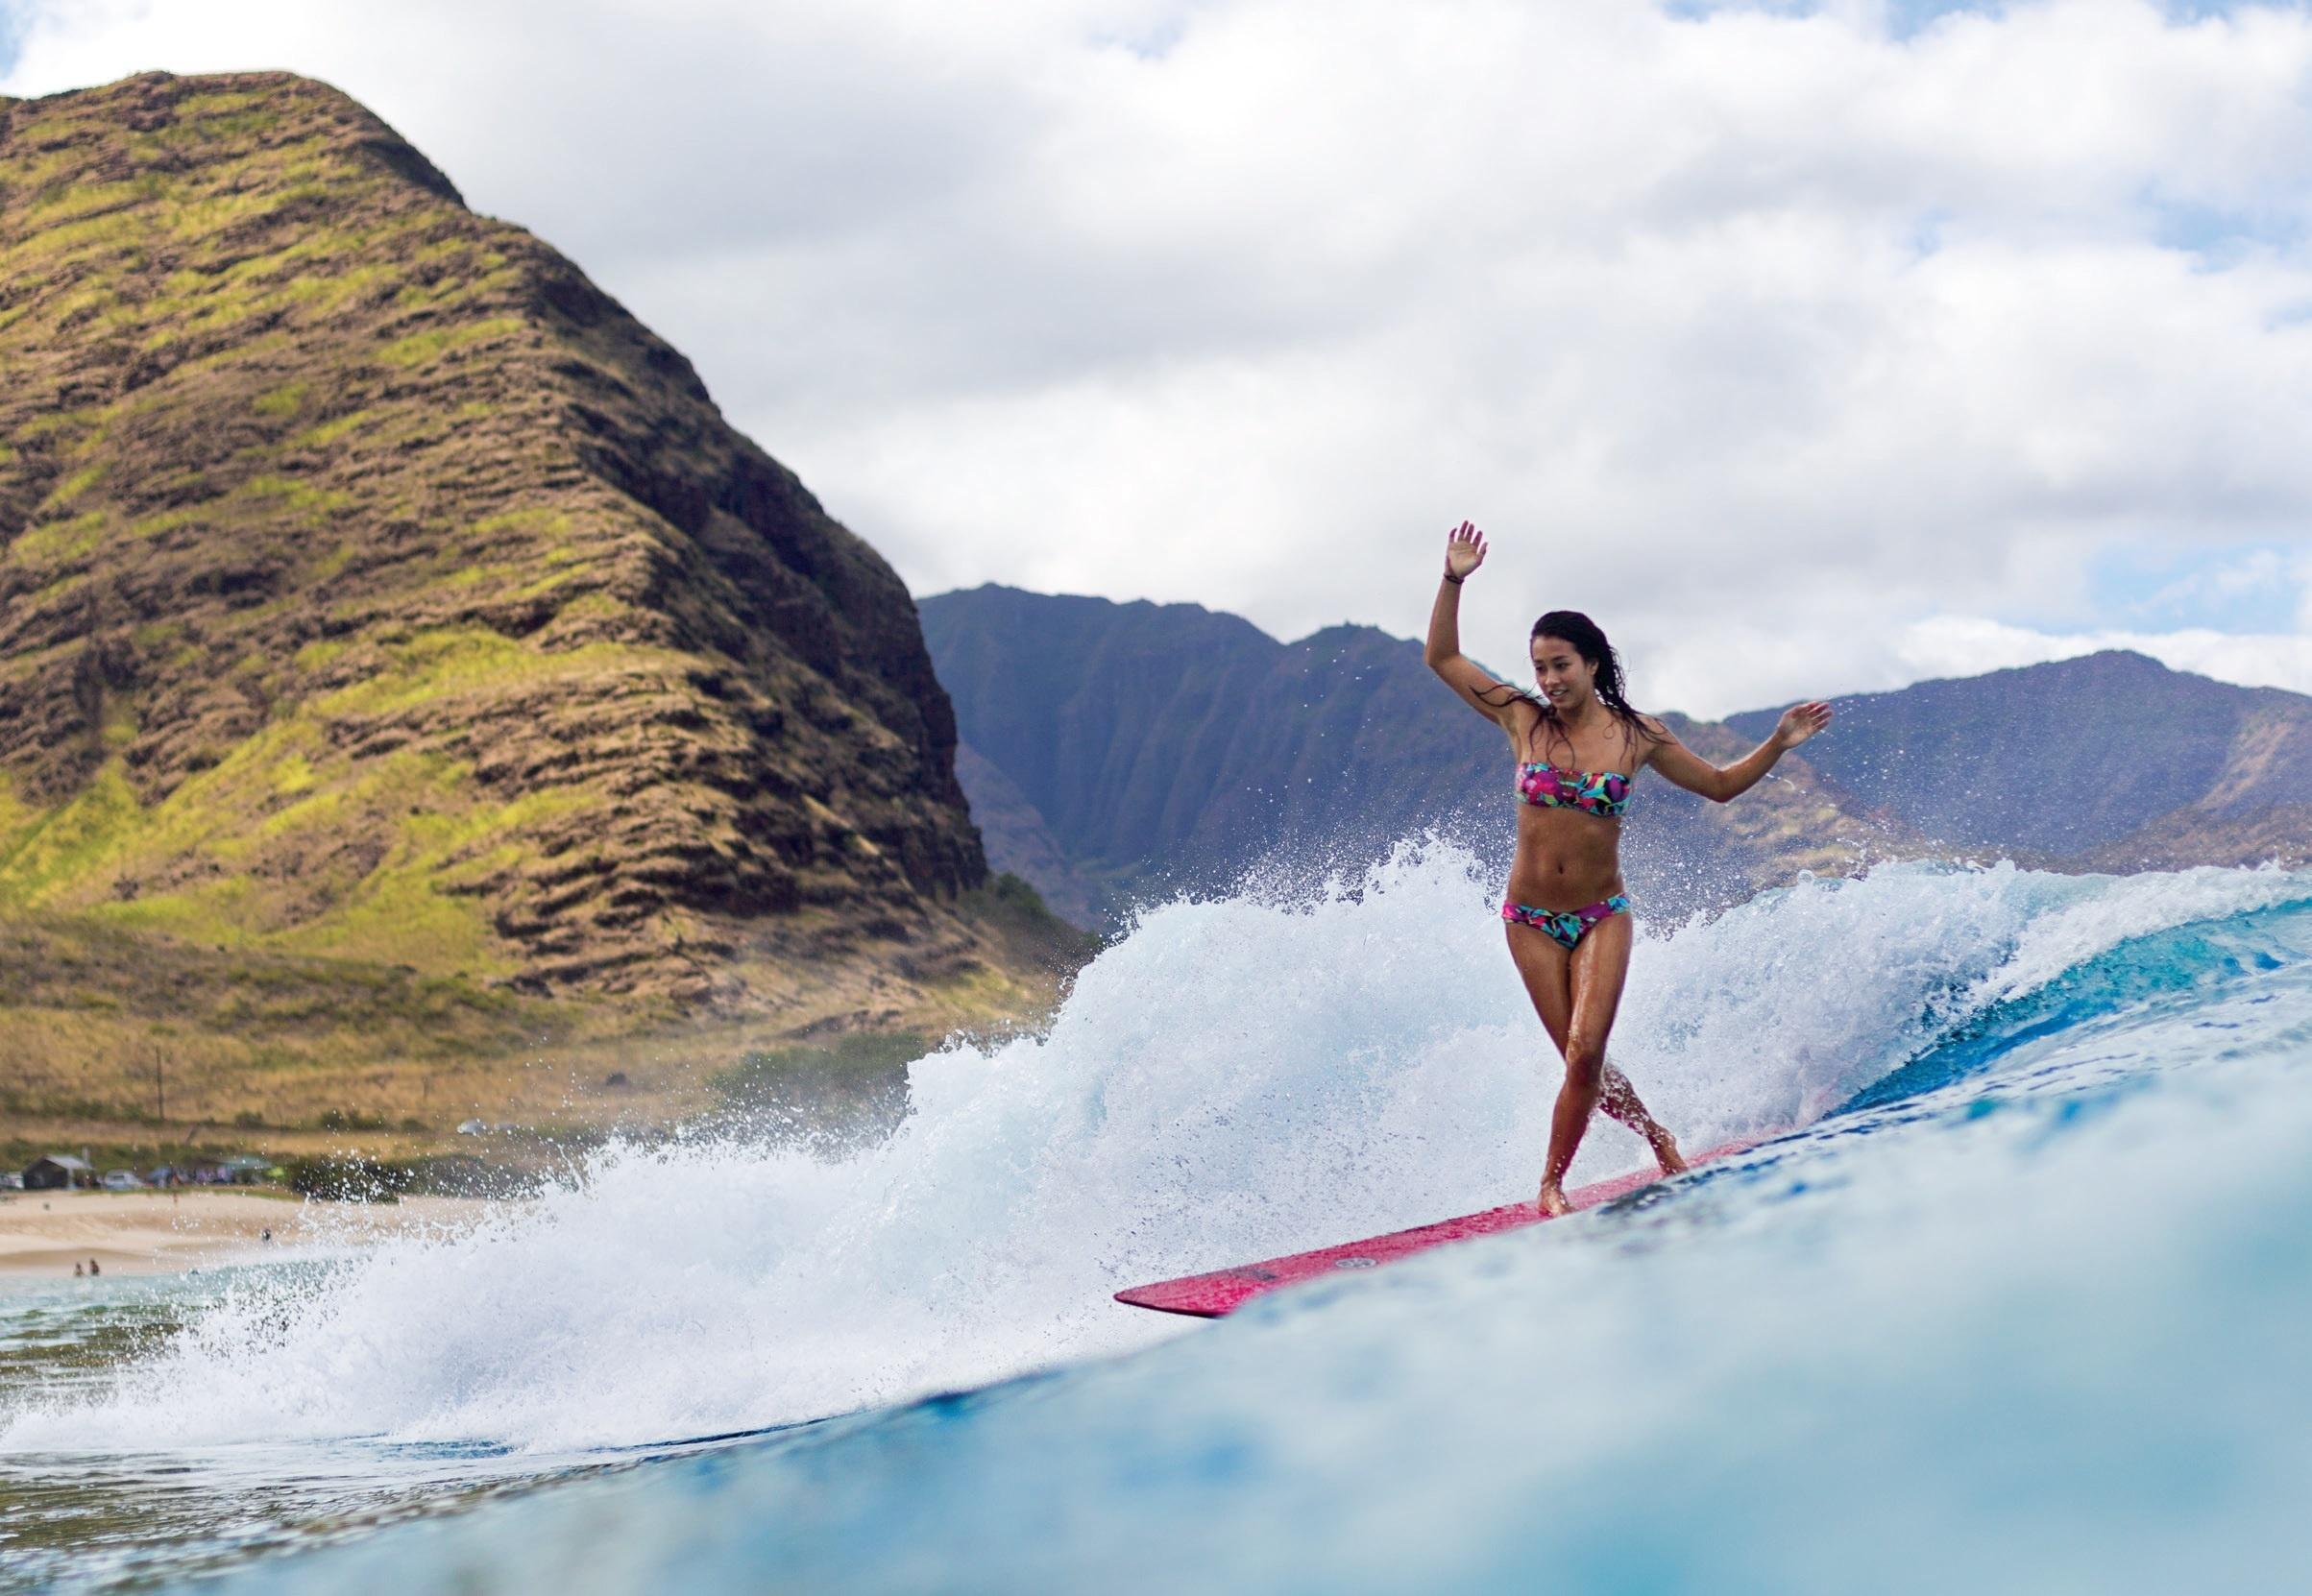 surfing ocean girl surfing mountain r wallpaper | 2407x1662 | 117561